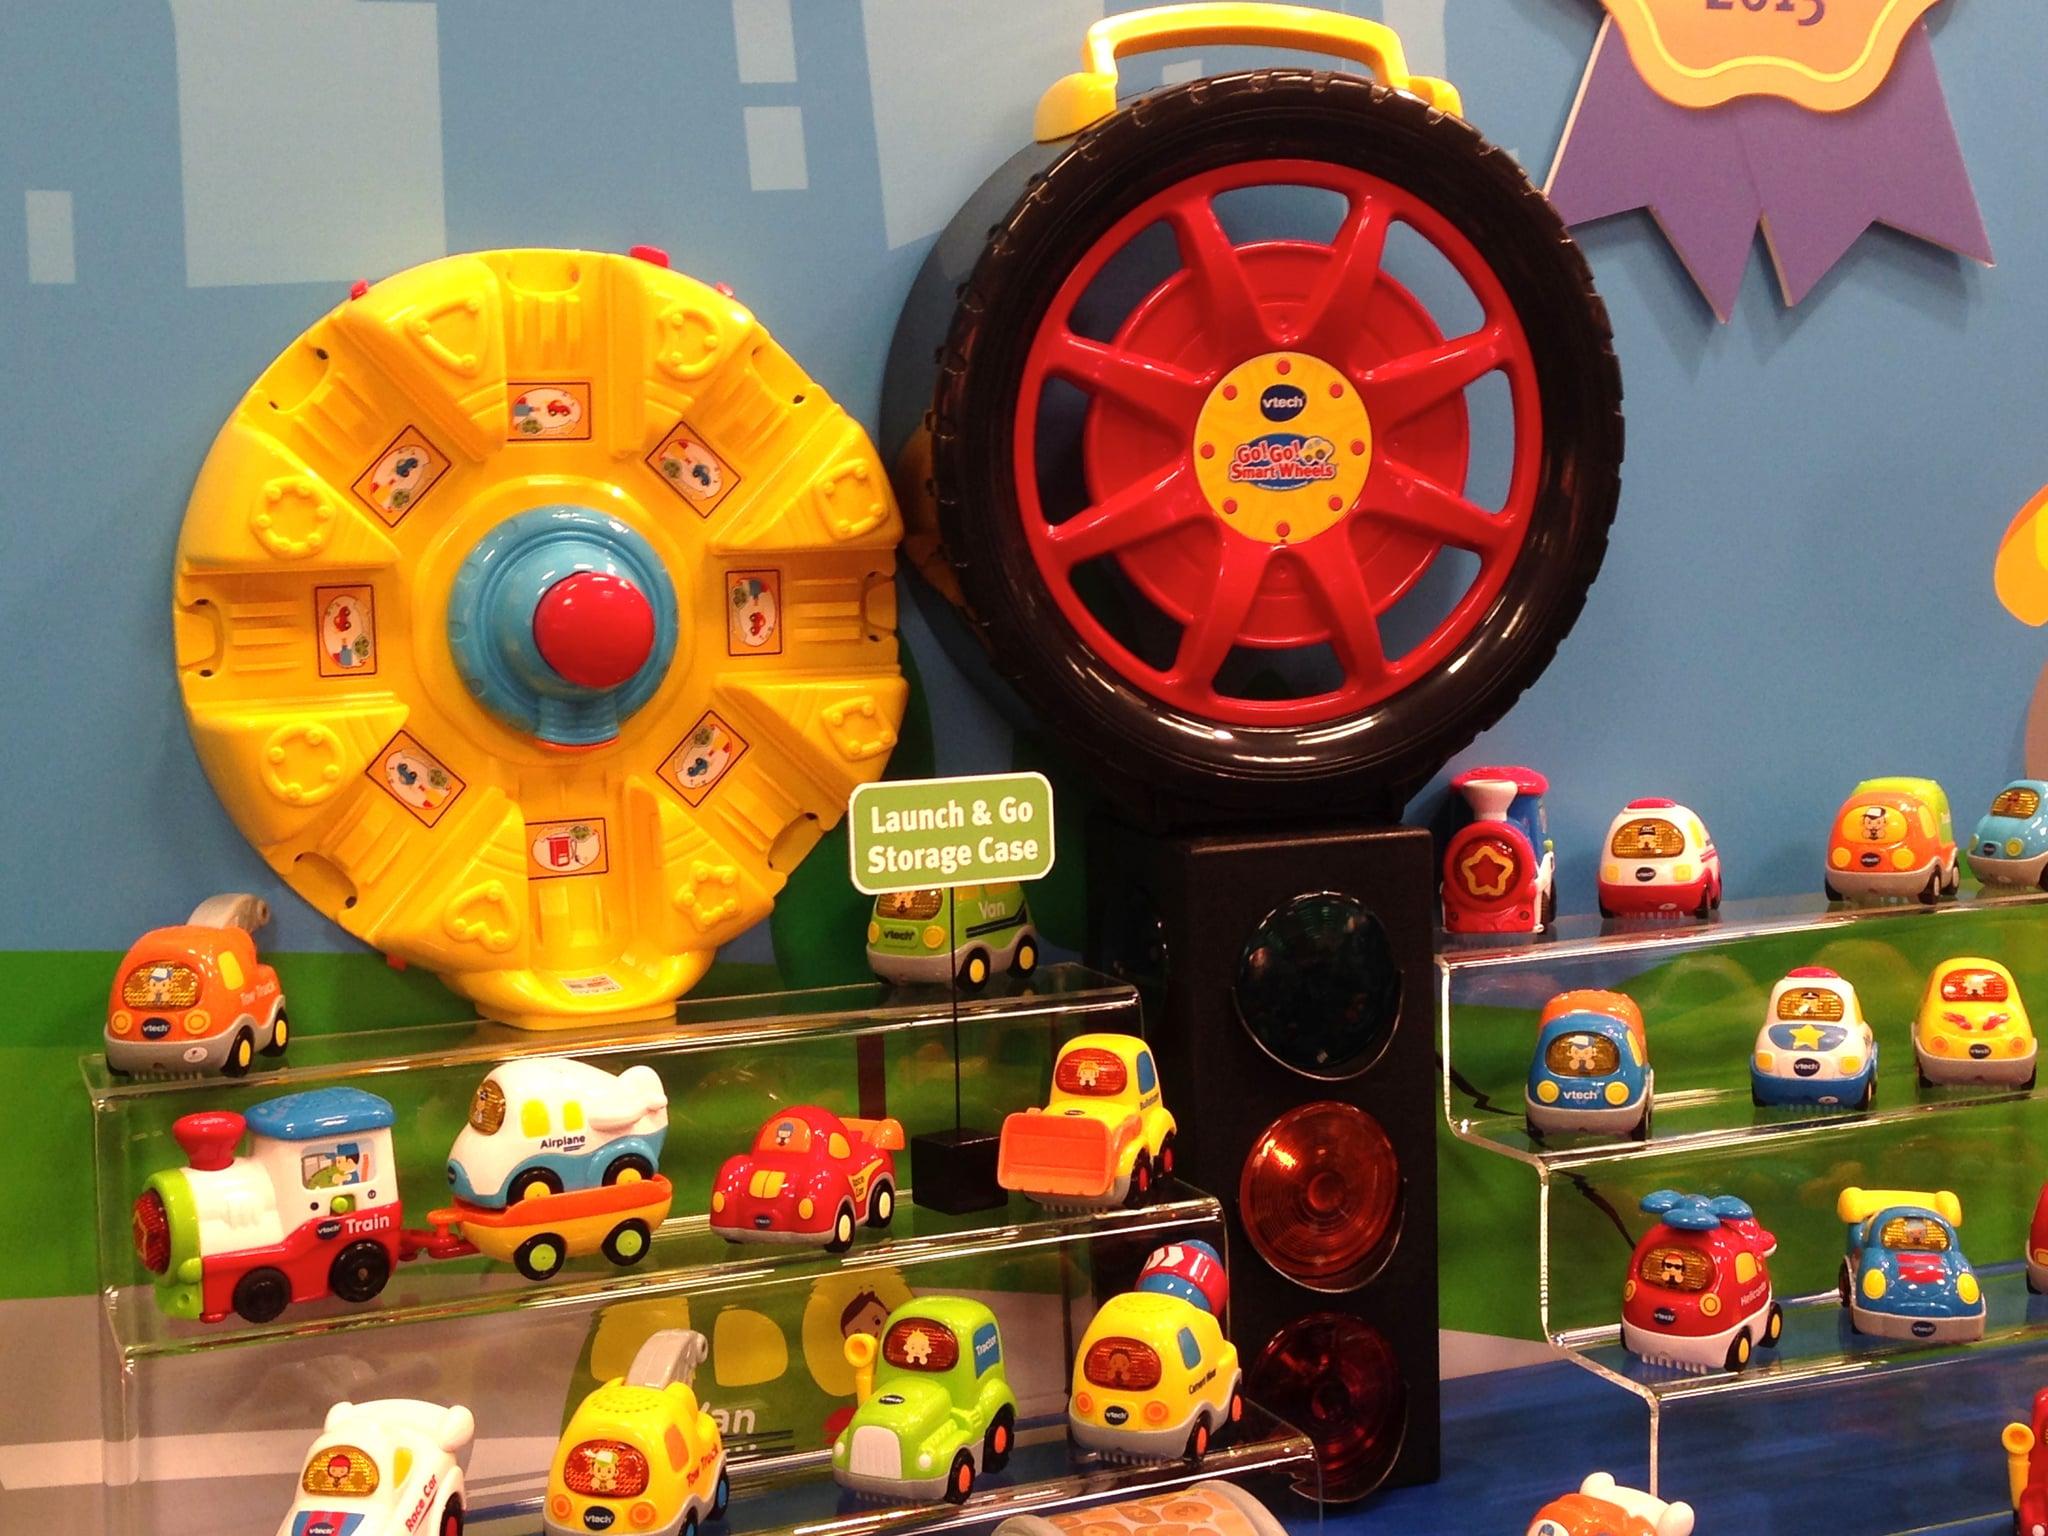 Go! Go! Smart Wheels Launch & Go Storage Case